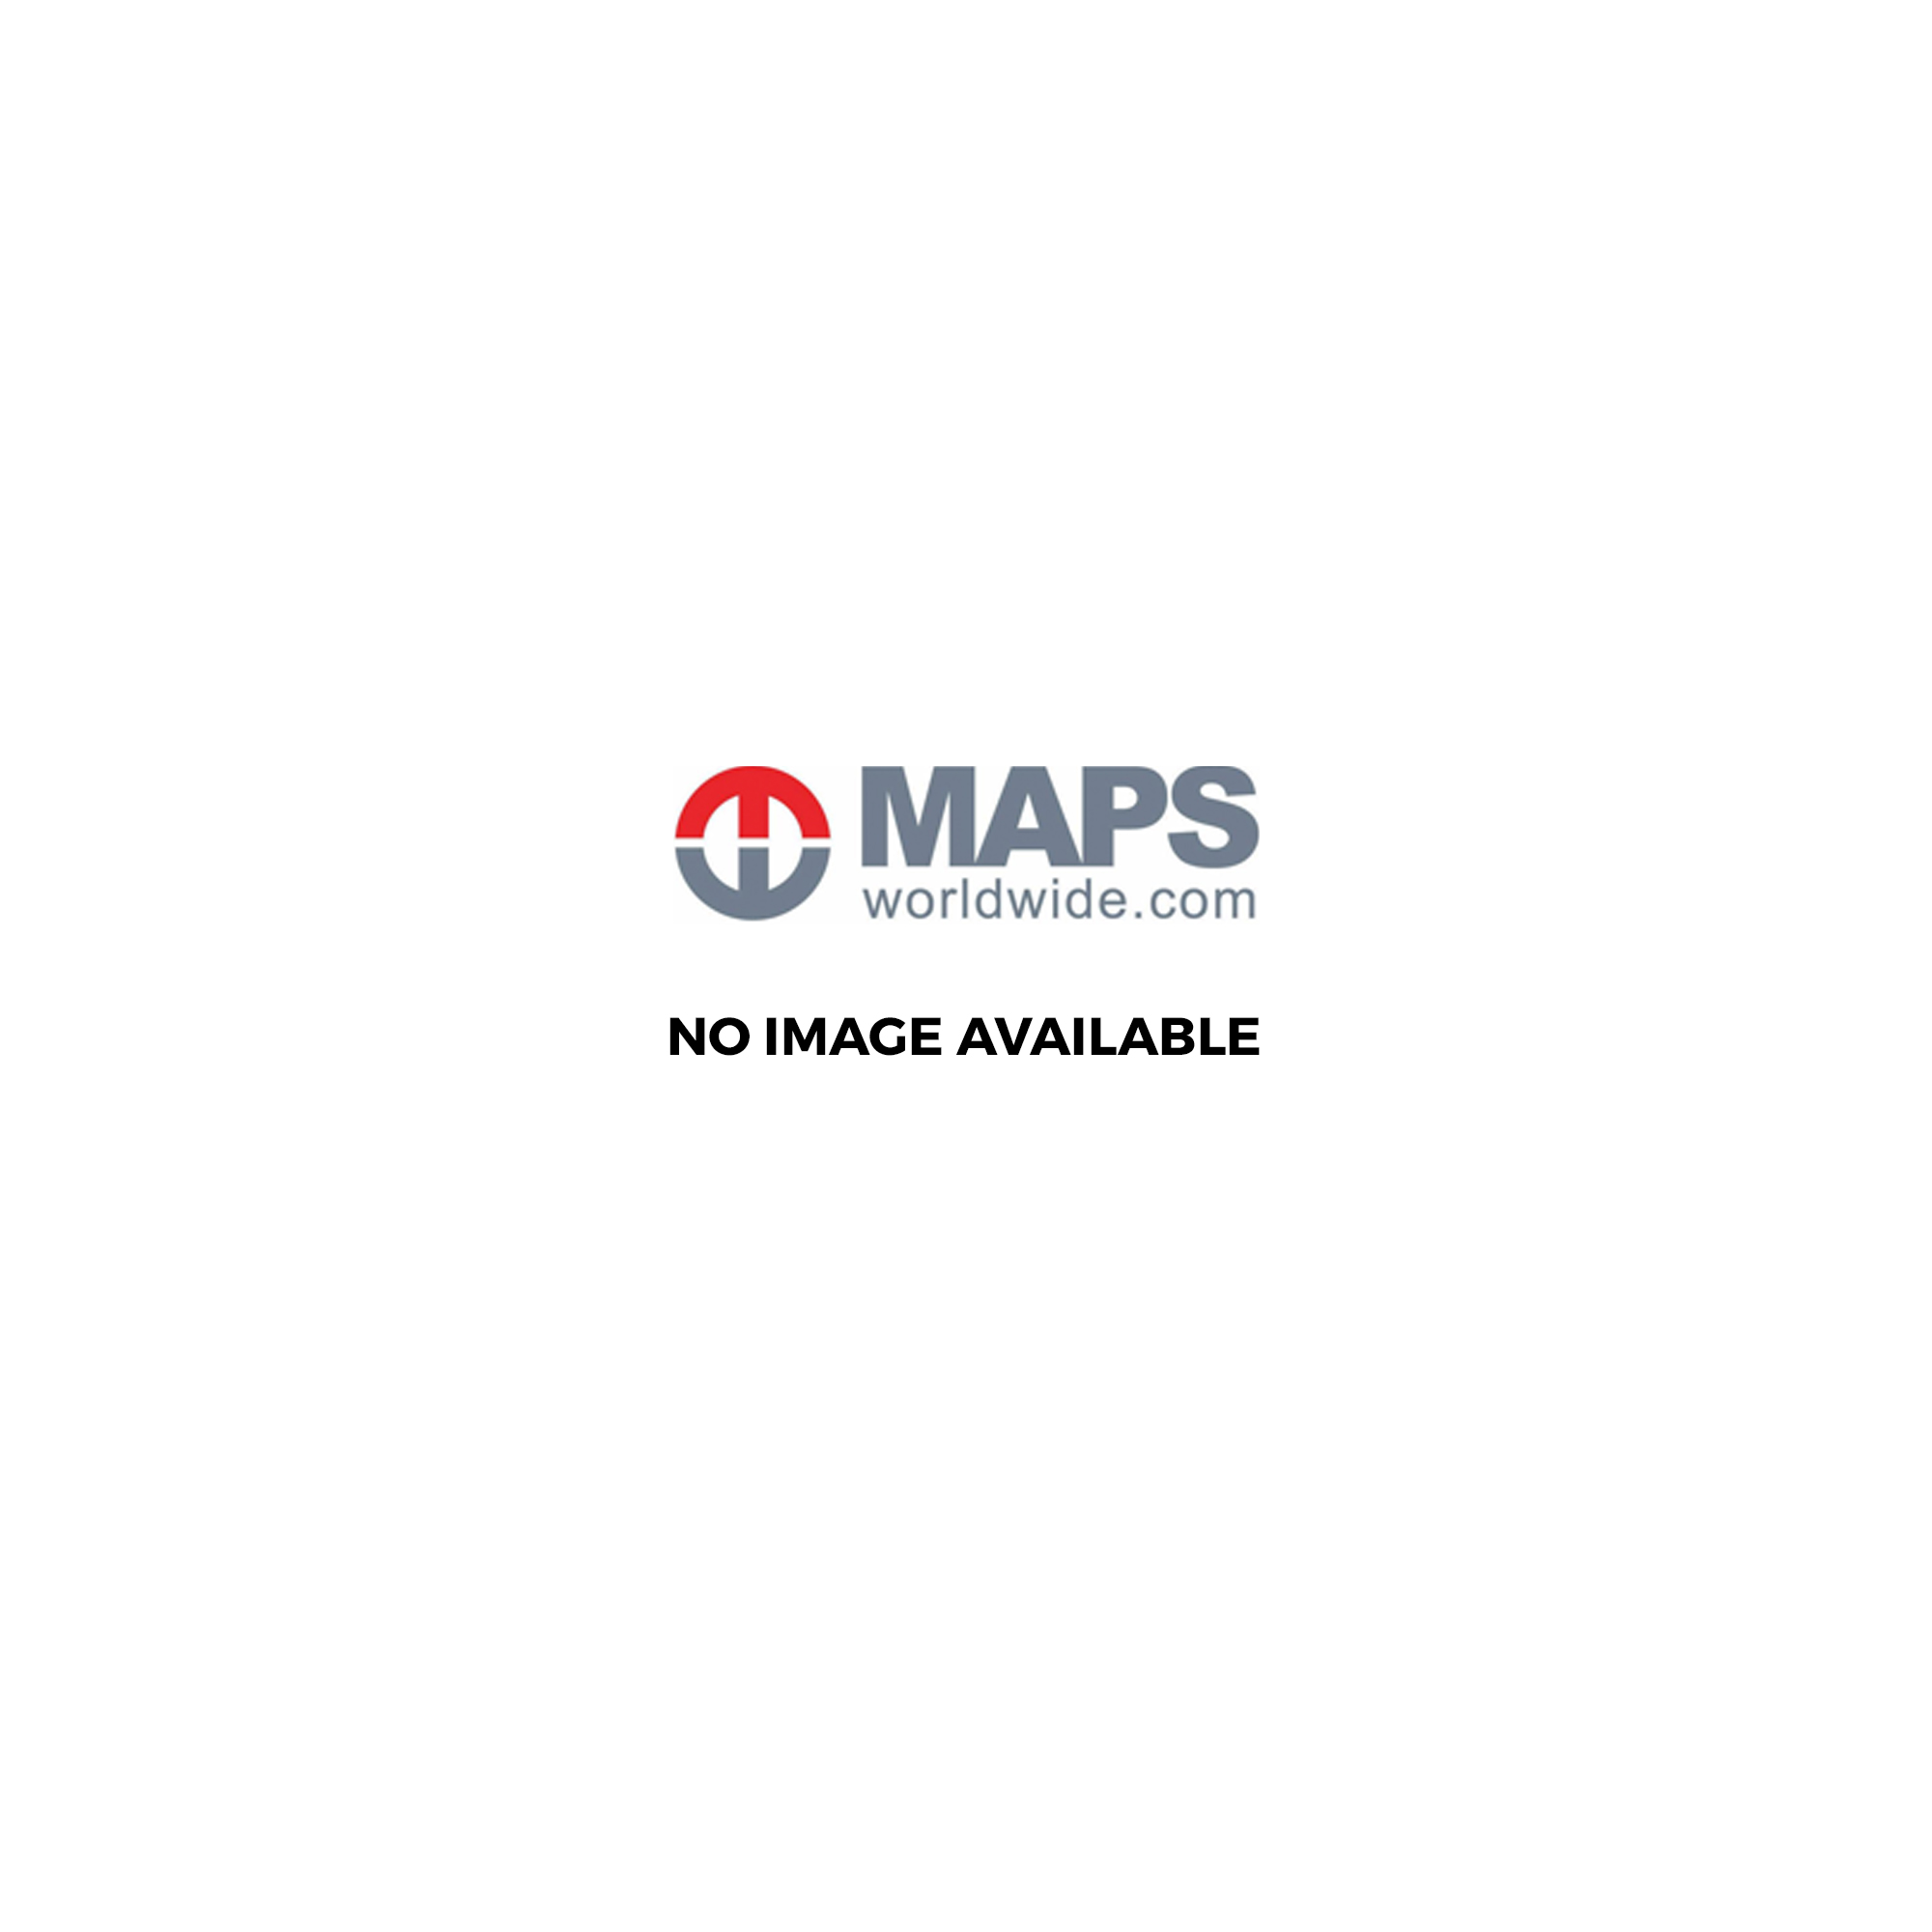 Road Atlas Map Of The Usa Laminated American Southwest Usa Map - Road atlas usa